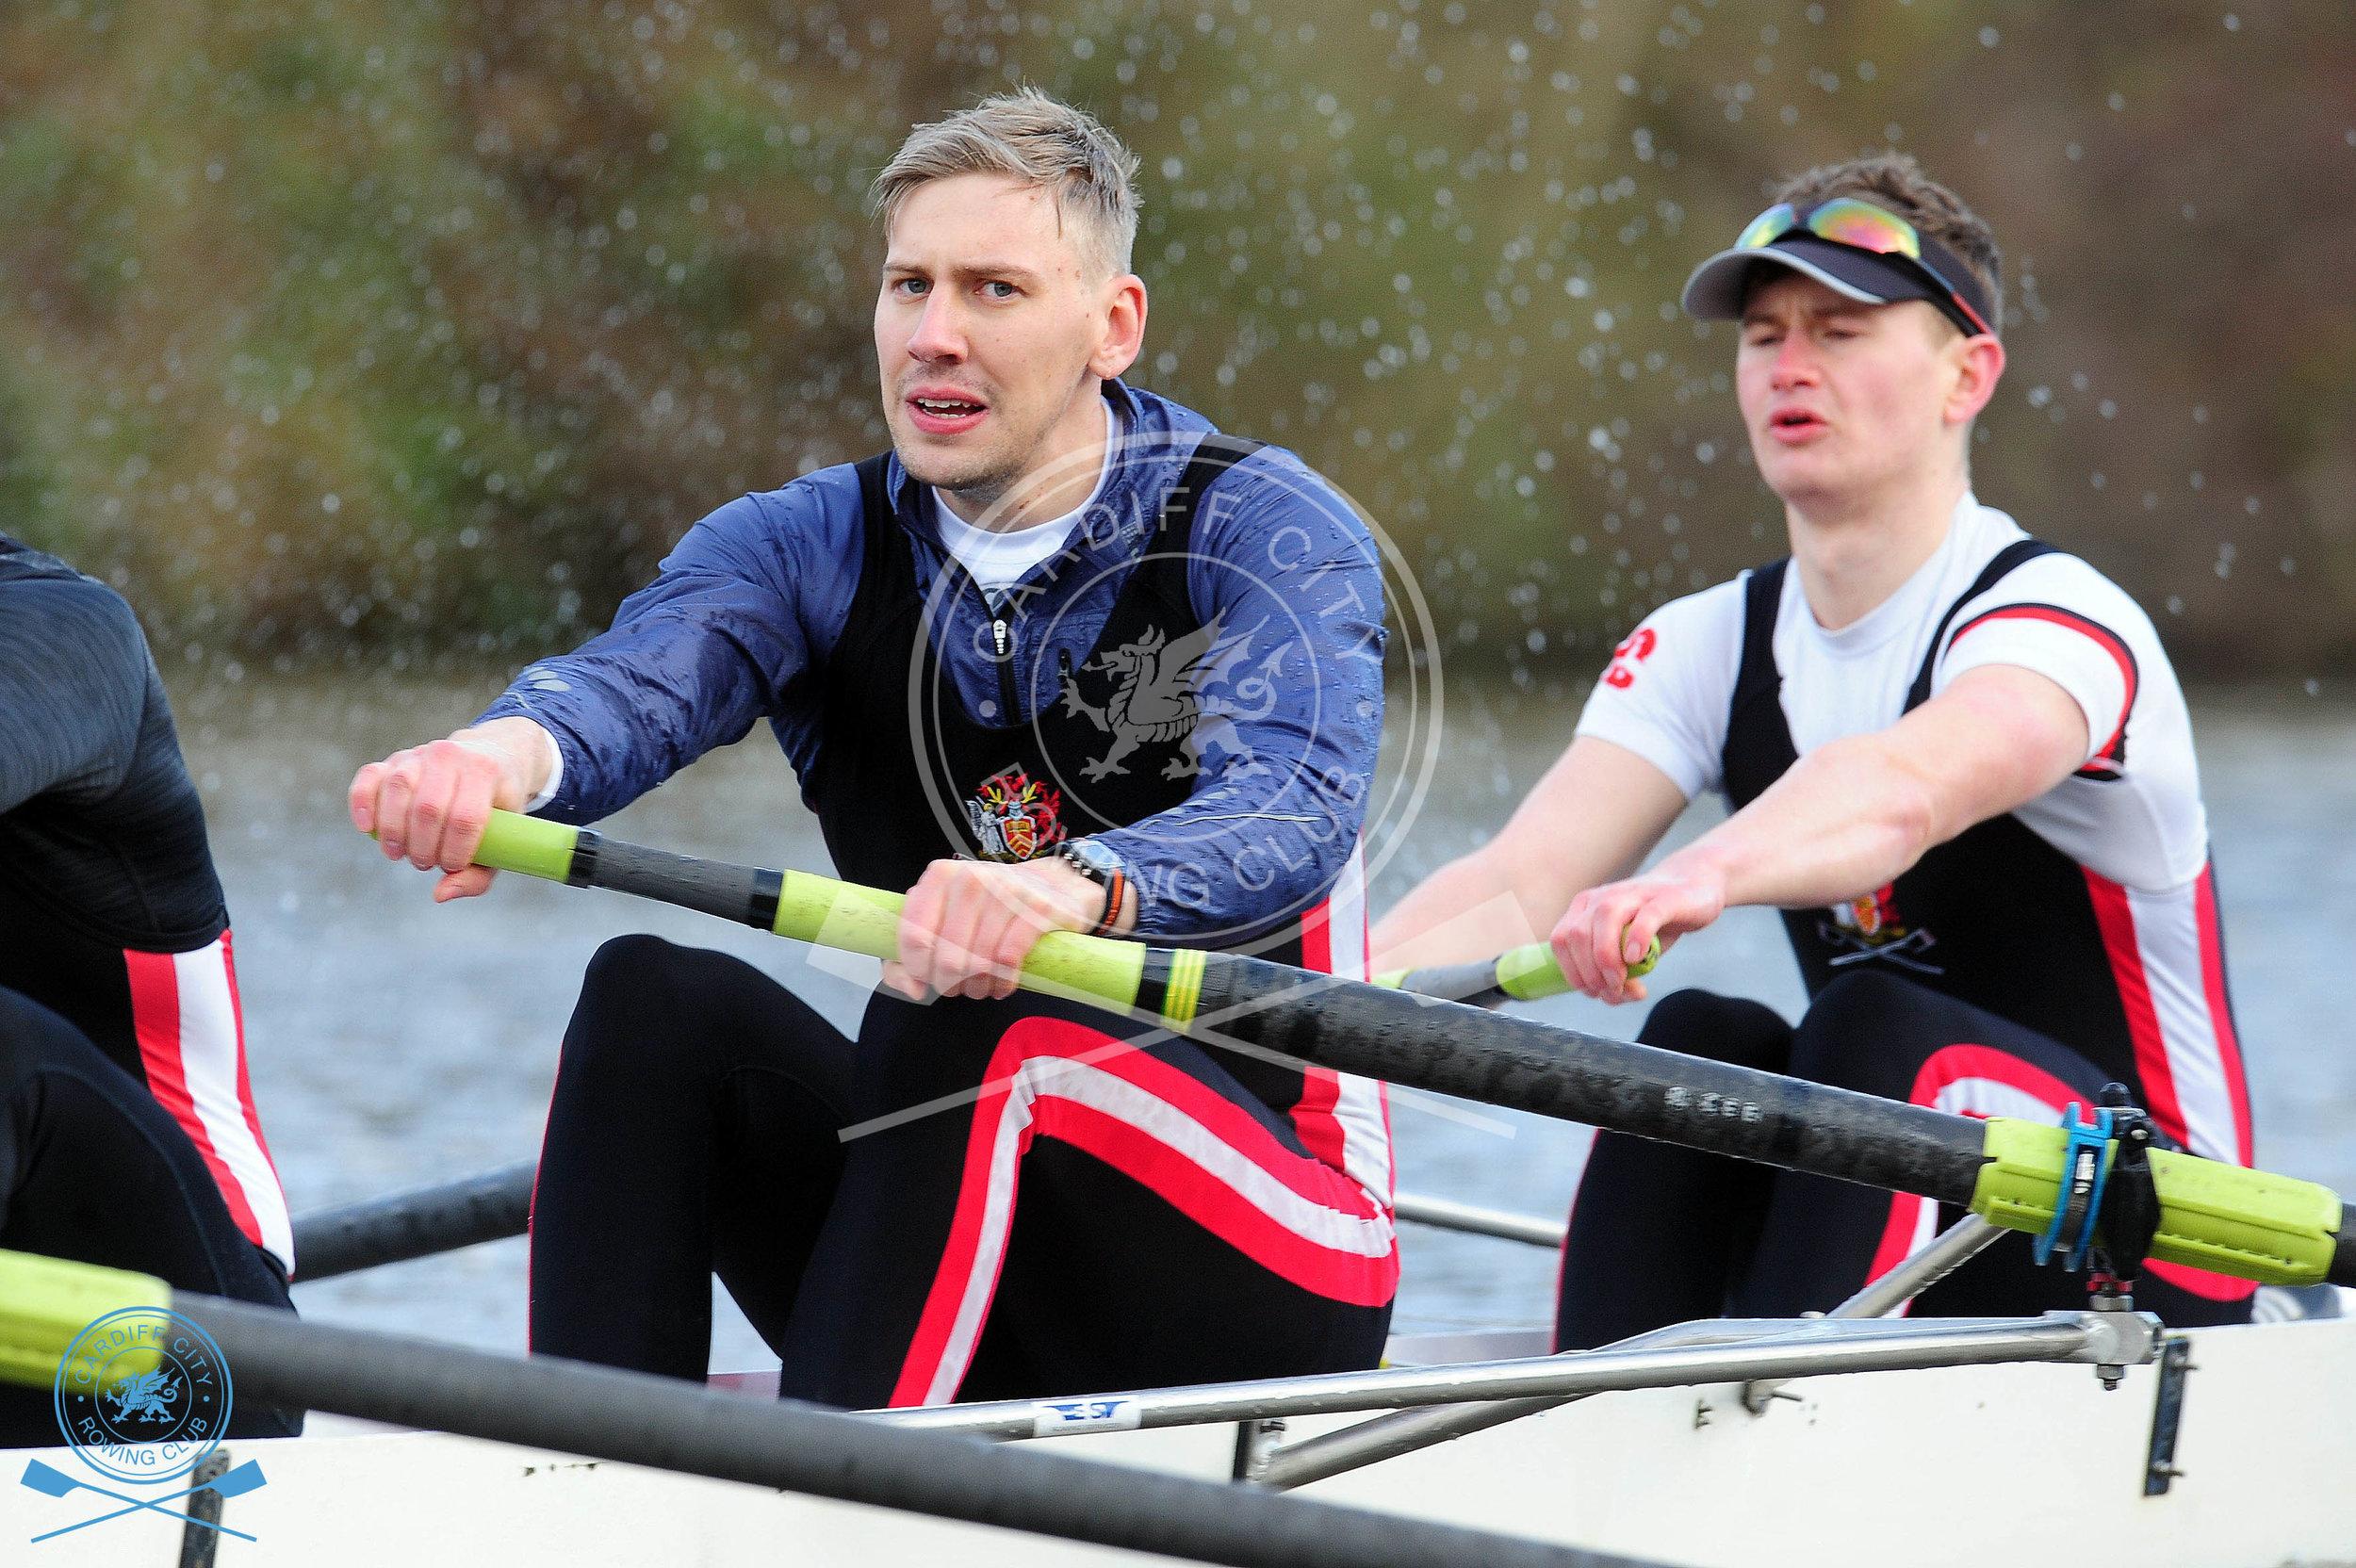 DW_280119_Cardiff_City_Rowing_260.jpg